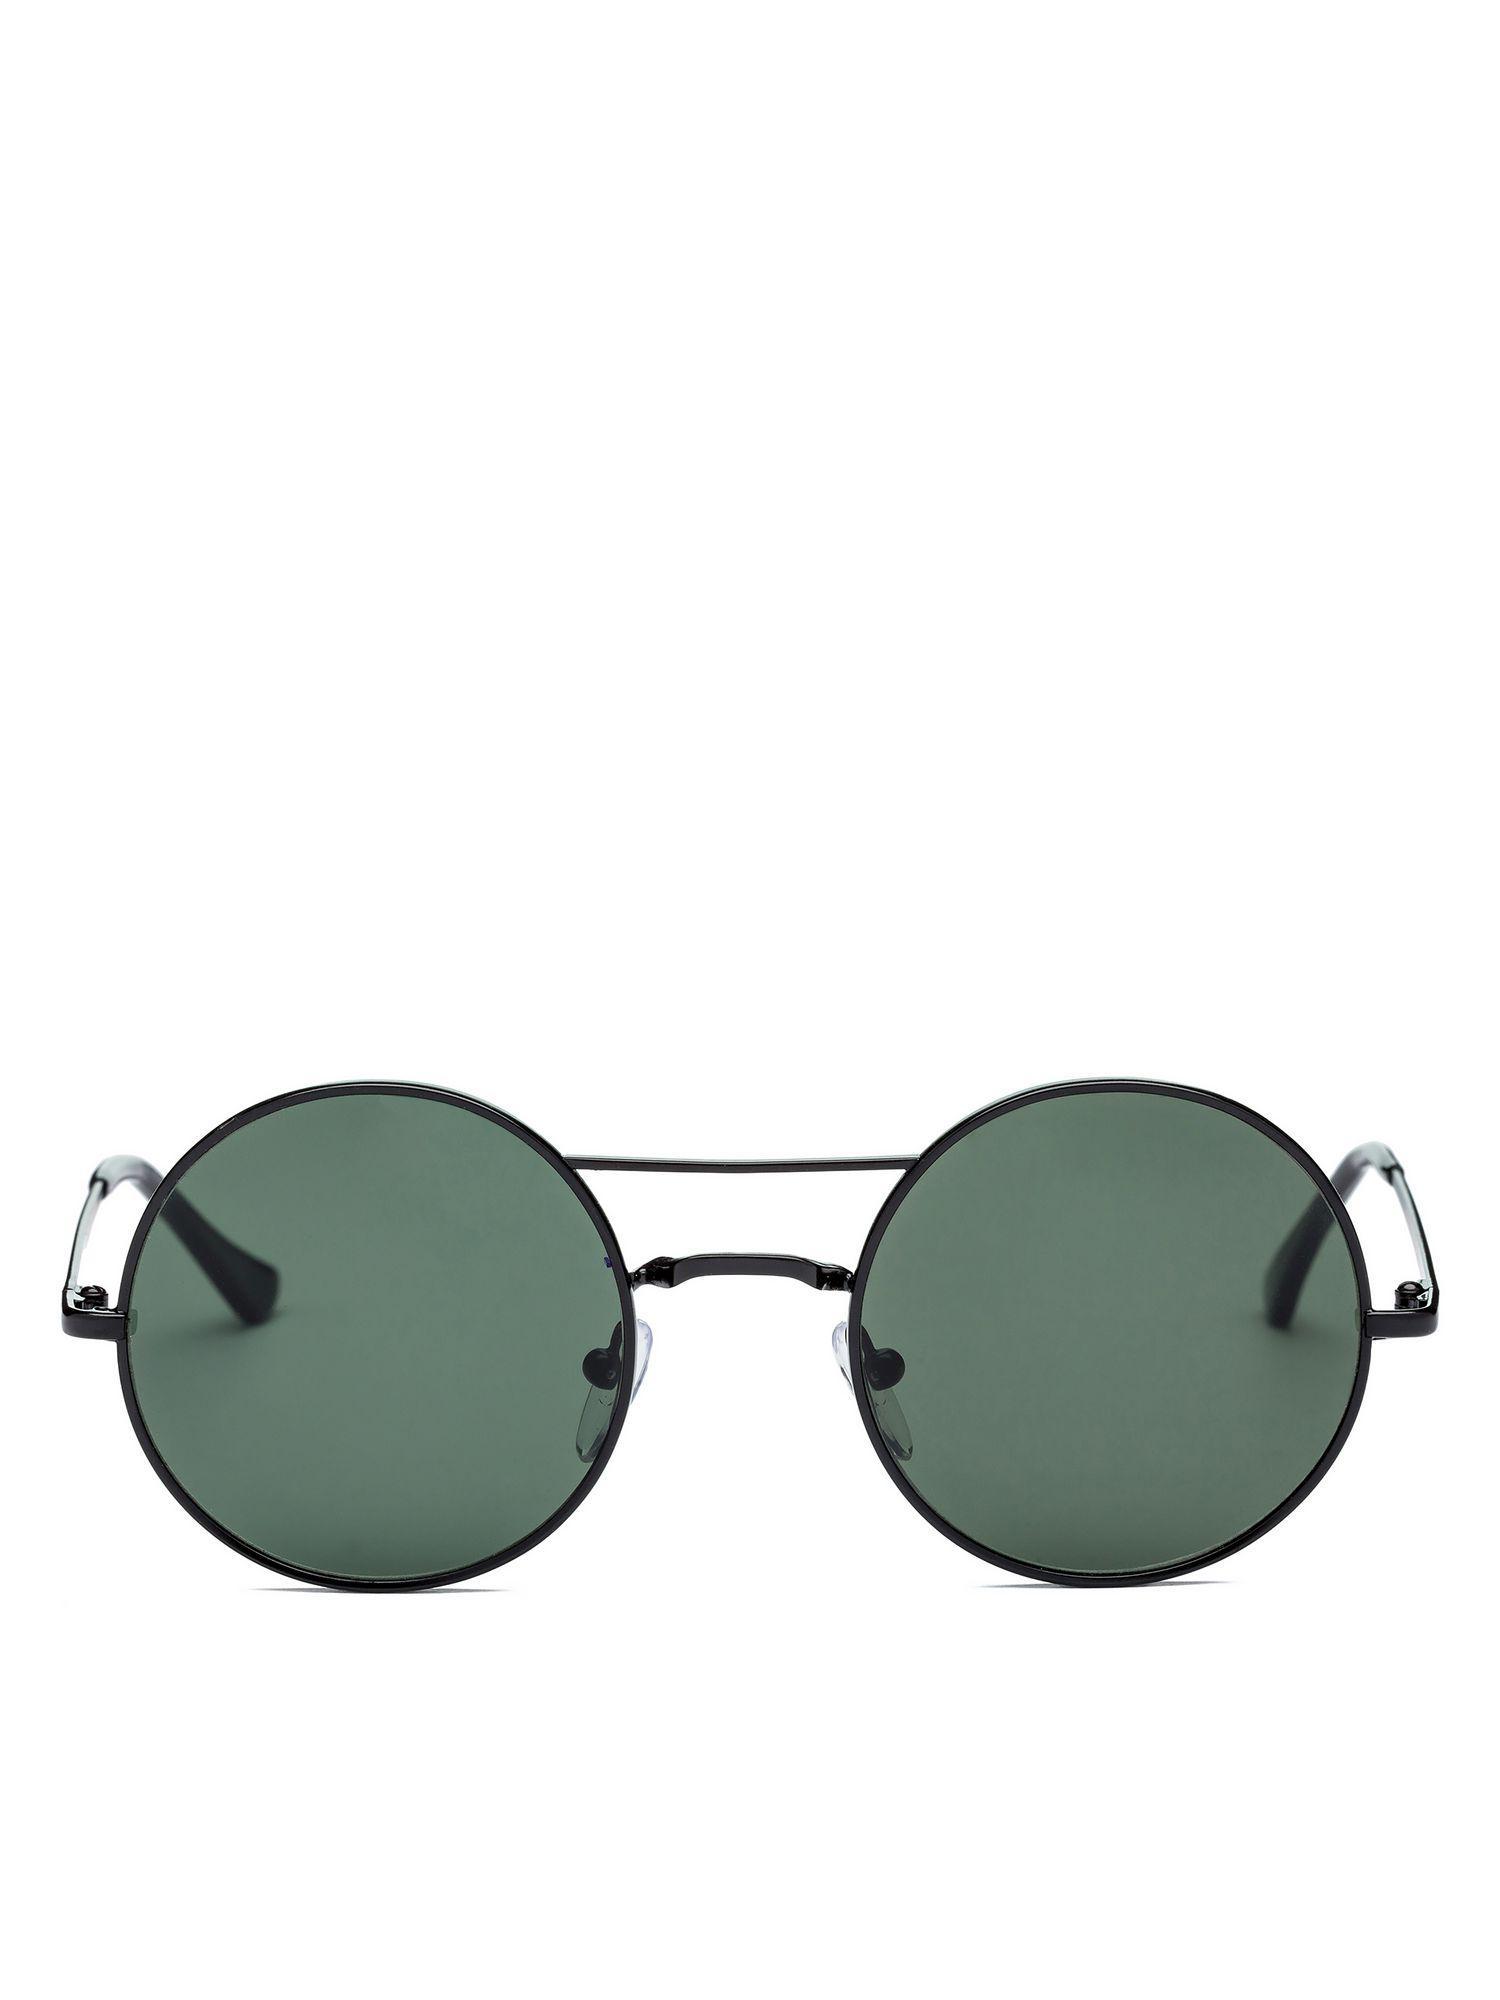 5dd332dfe28 Lyst - Marni Dot Glasses In Metal in Metallic